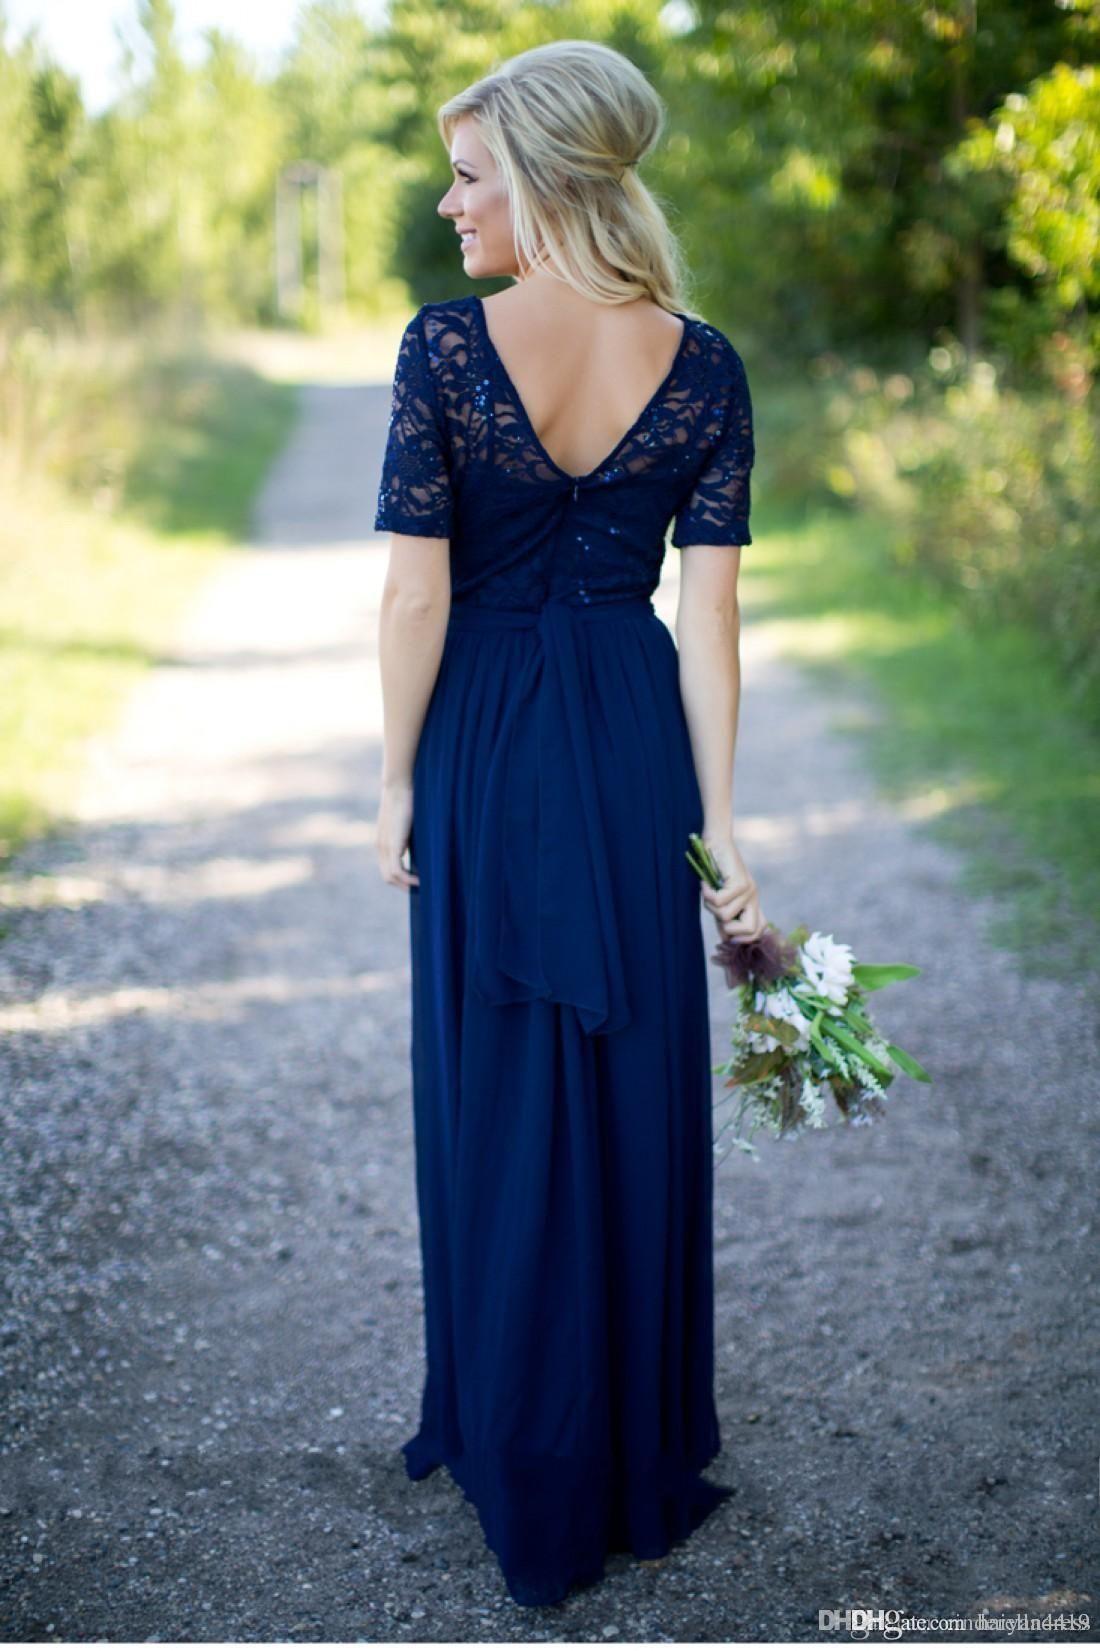 Dark purple wedding dress  Country Bridesmaid Dresses  Hot Long For Weddings Navy Blue